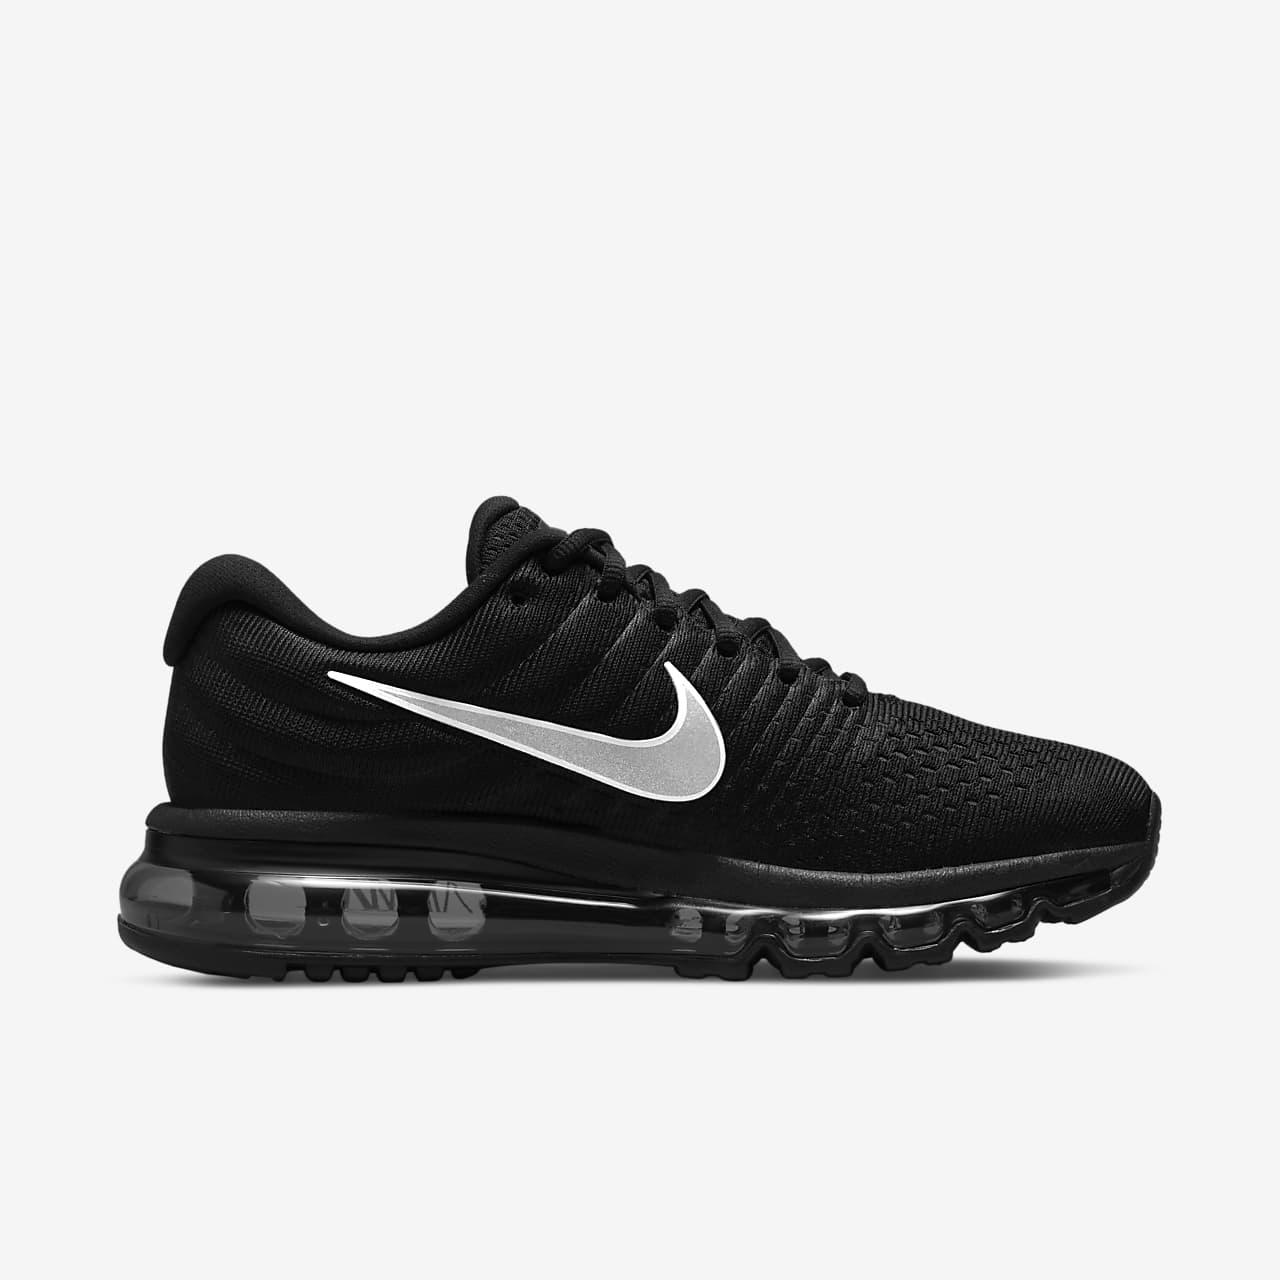 save off 83fe1 a7142 Sko för kvinnor. Nike Air Max 2017